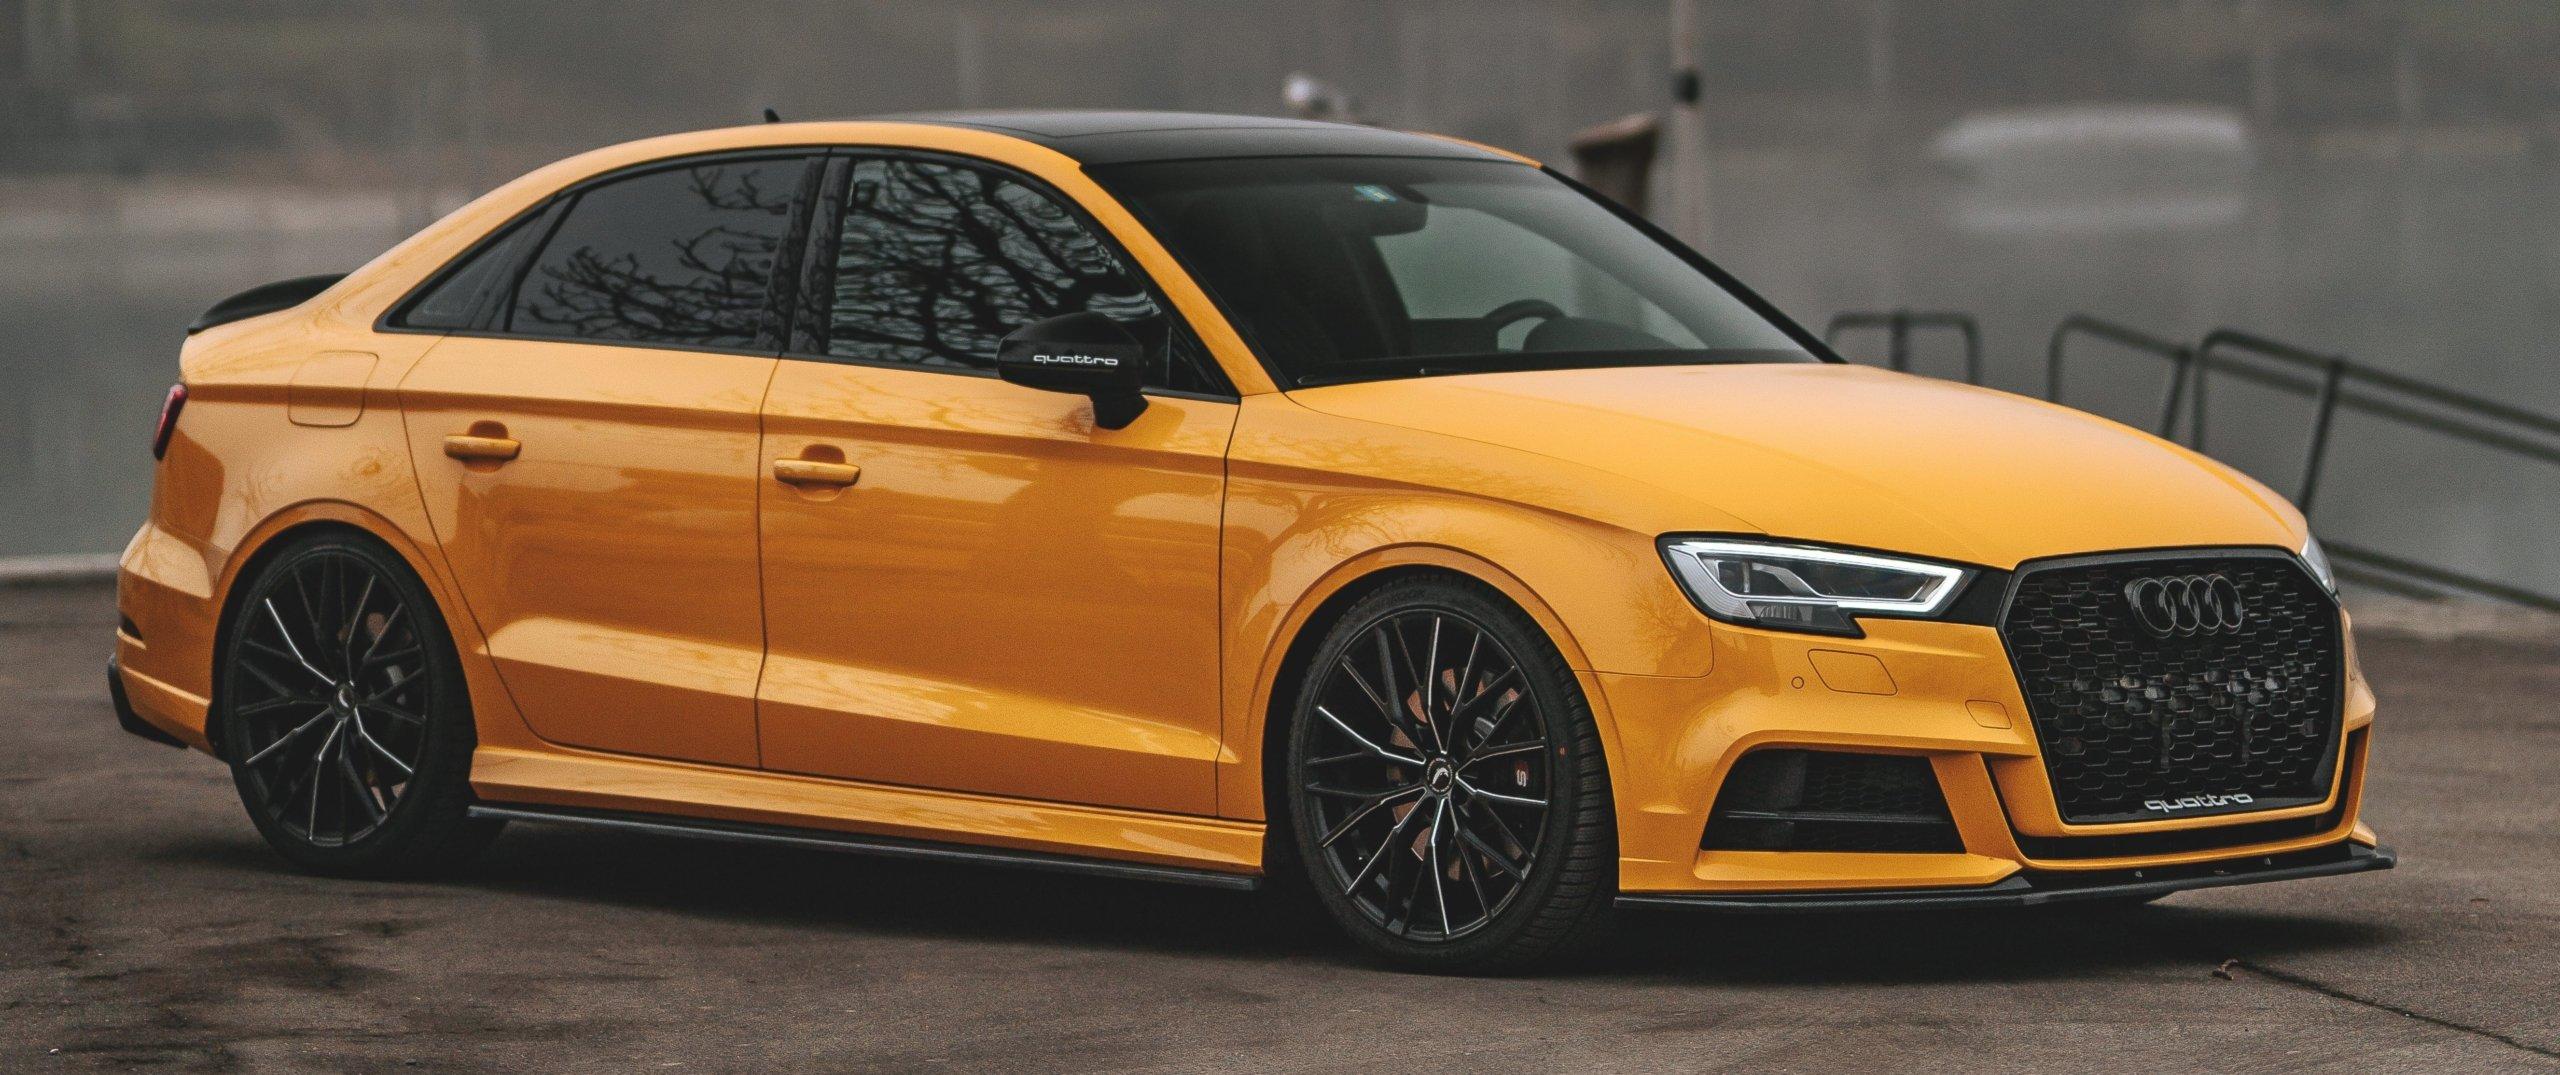 Audi – RS3 – Orange – BARRACUDA – Ultralight Project 3.0 – Schwarz – 19 Zoll